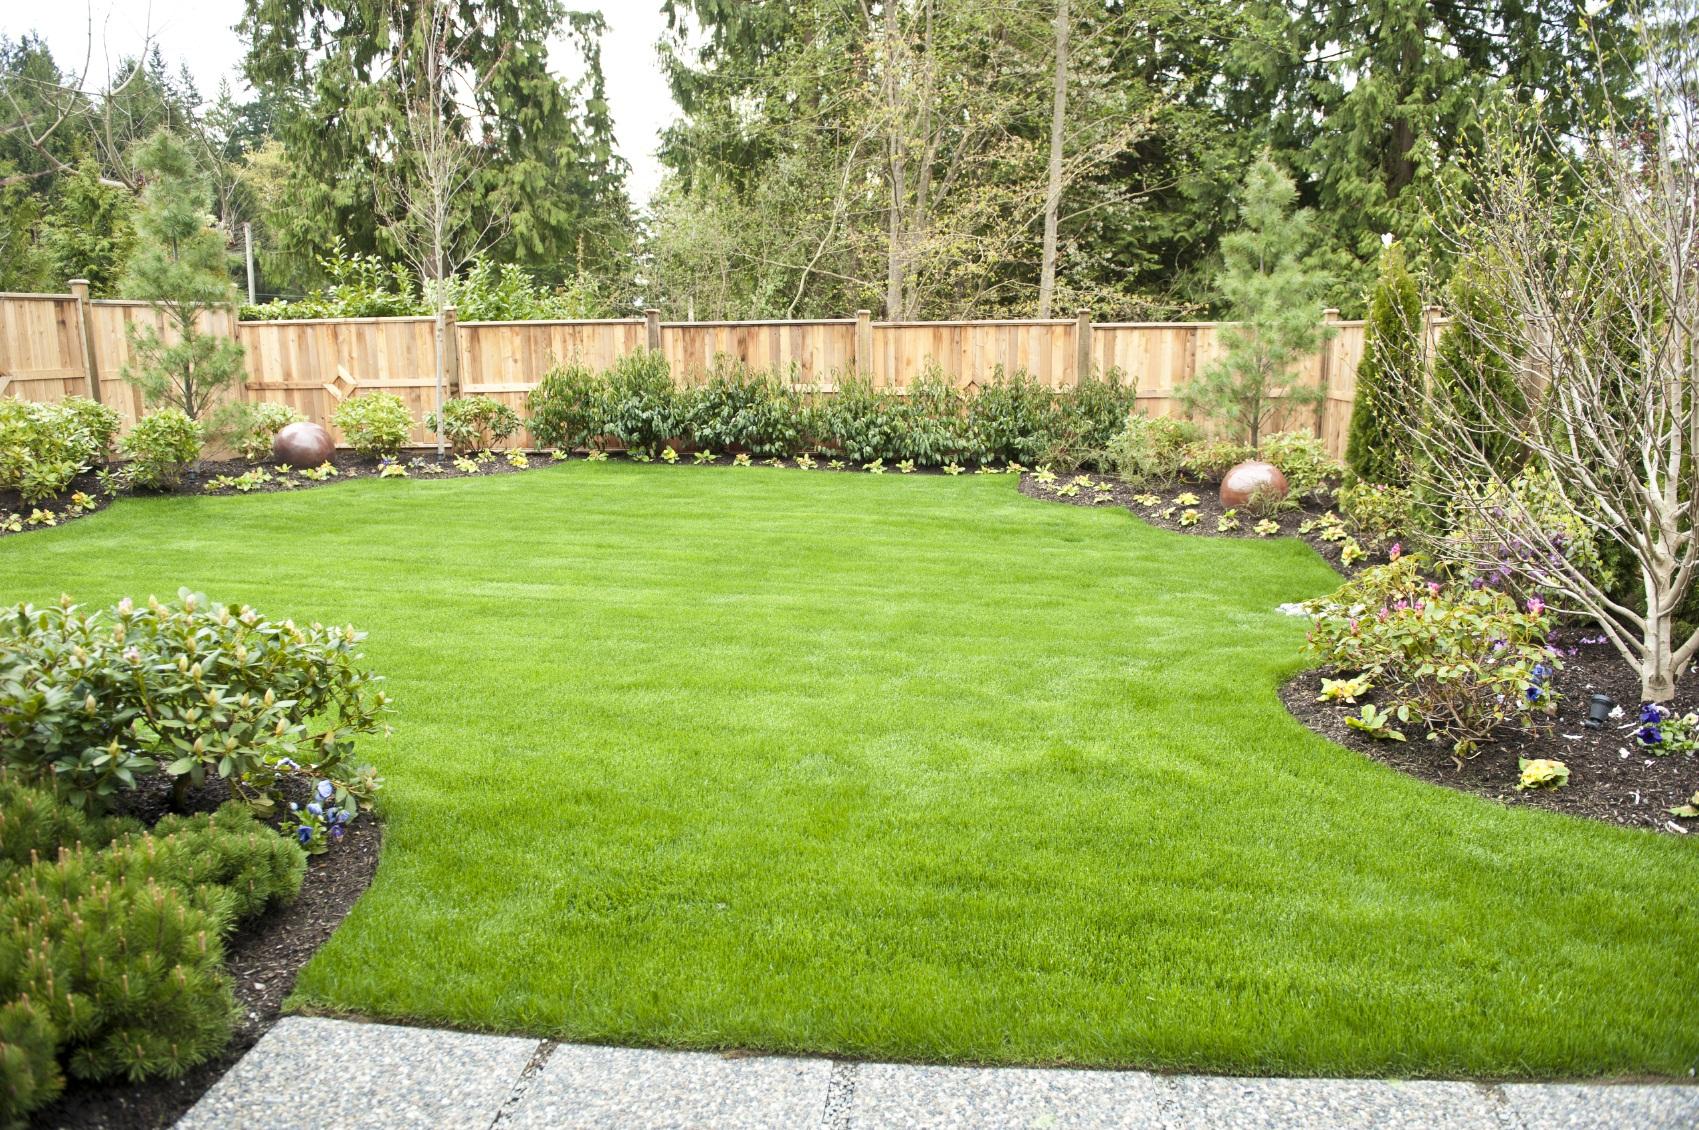 Backyard Landscaping Tips | Metamorphosis Landscape Design on Easy Back Garden Ideas id=14632